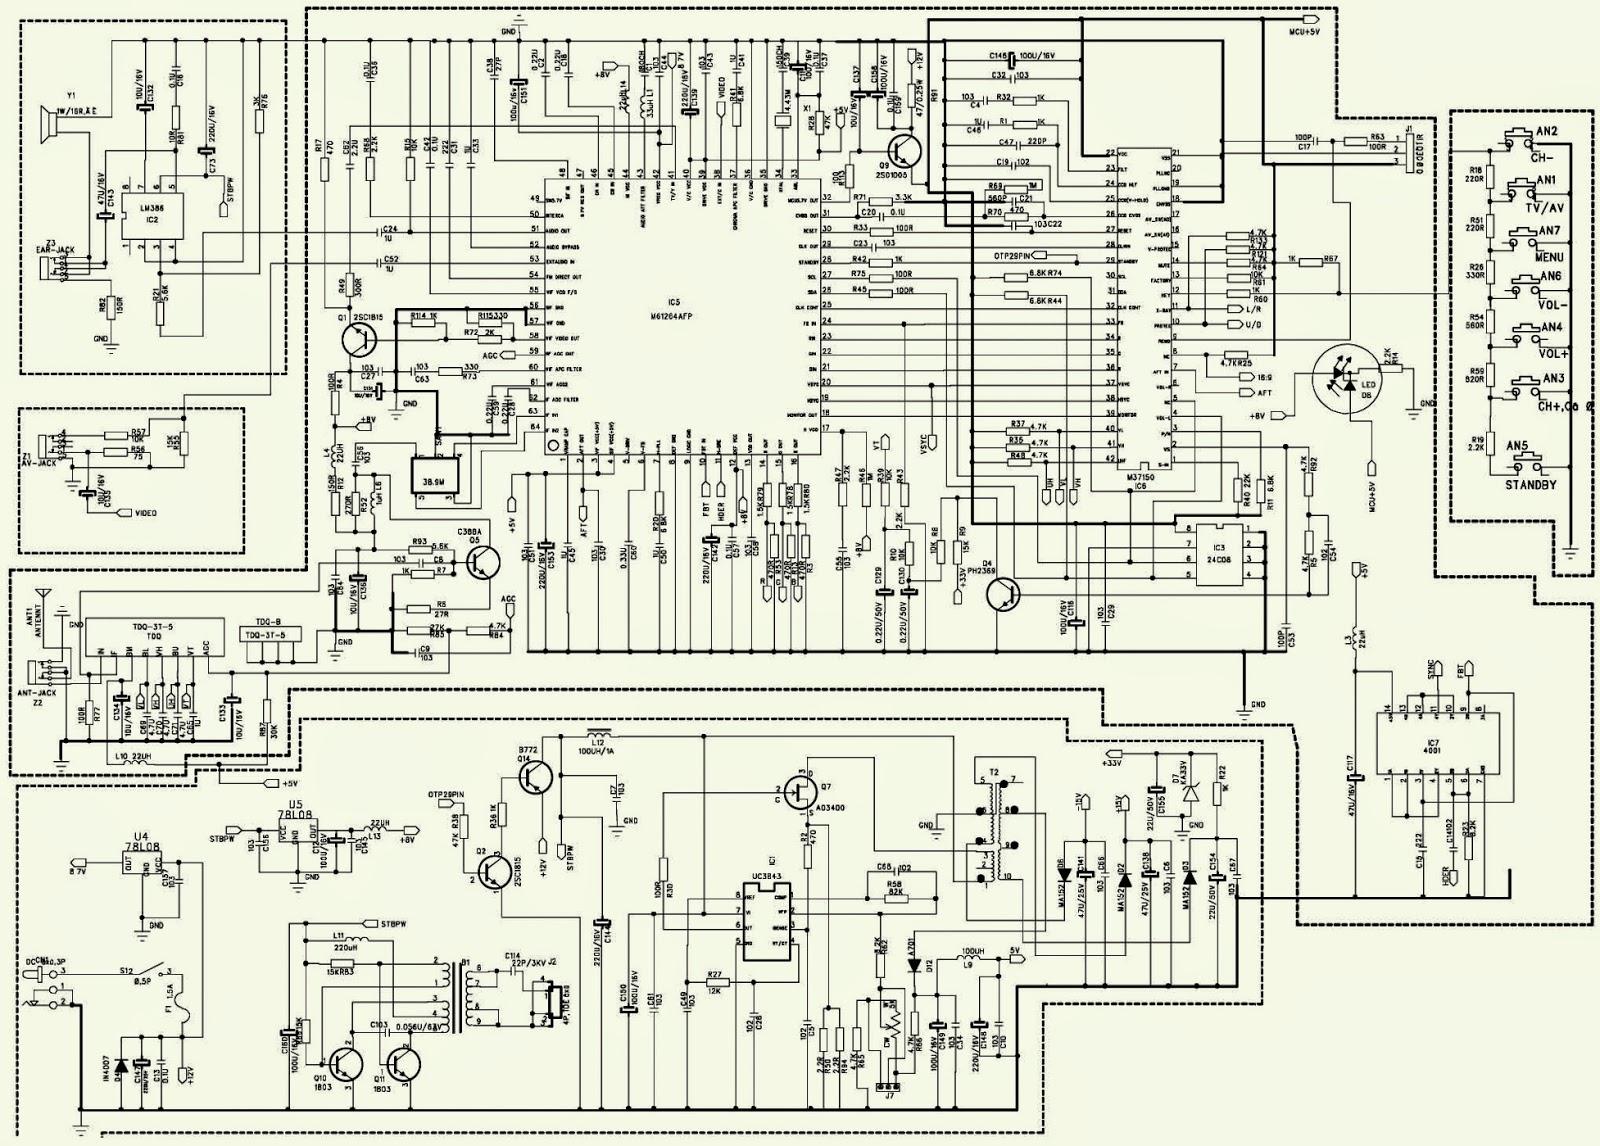 medium resolution of hyundai tv 800 7 inch tft lcd tv schematic circuit diagram